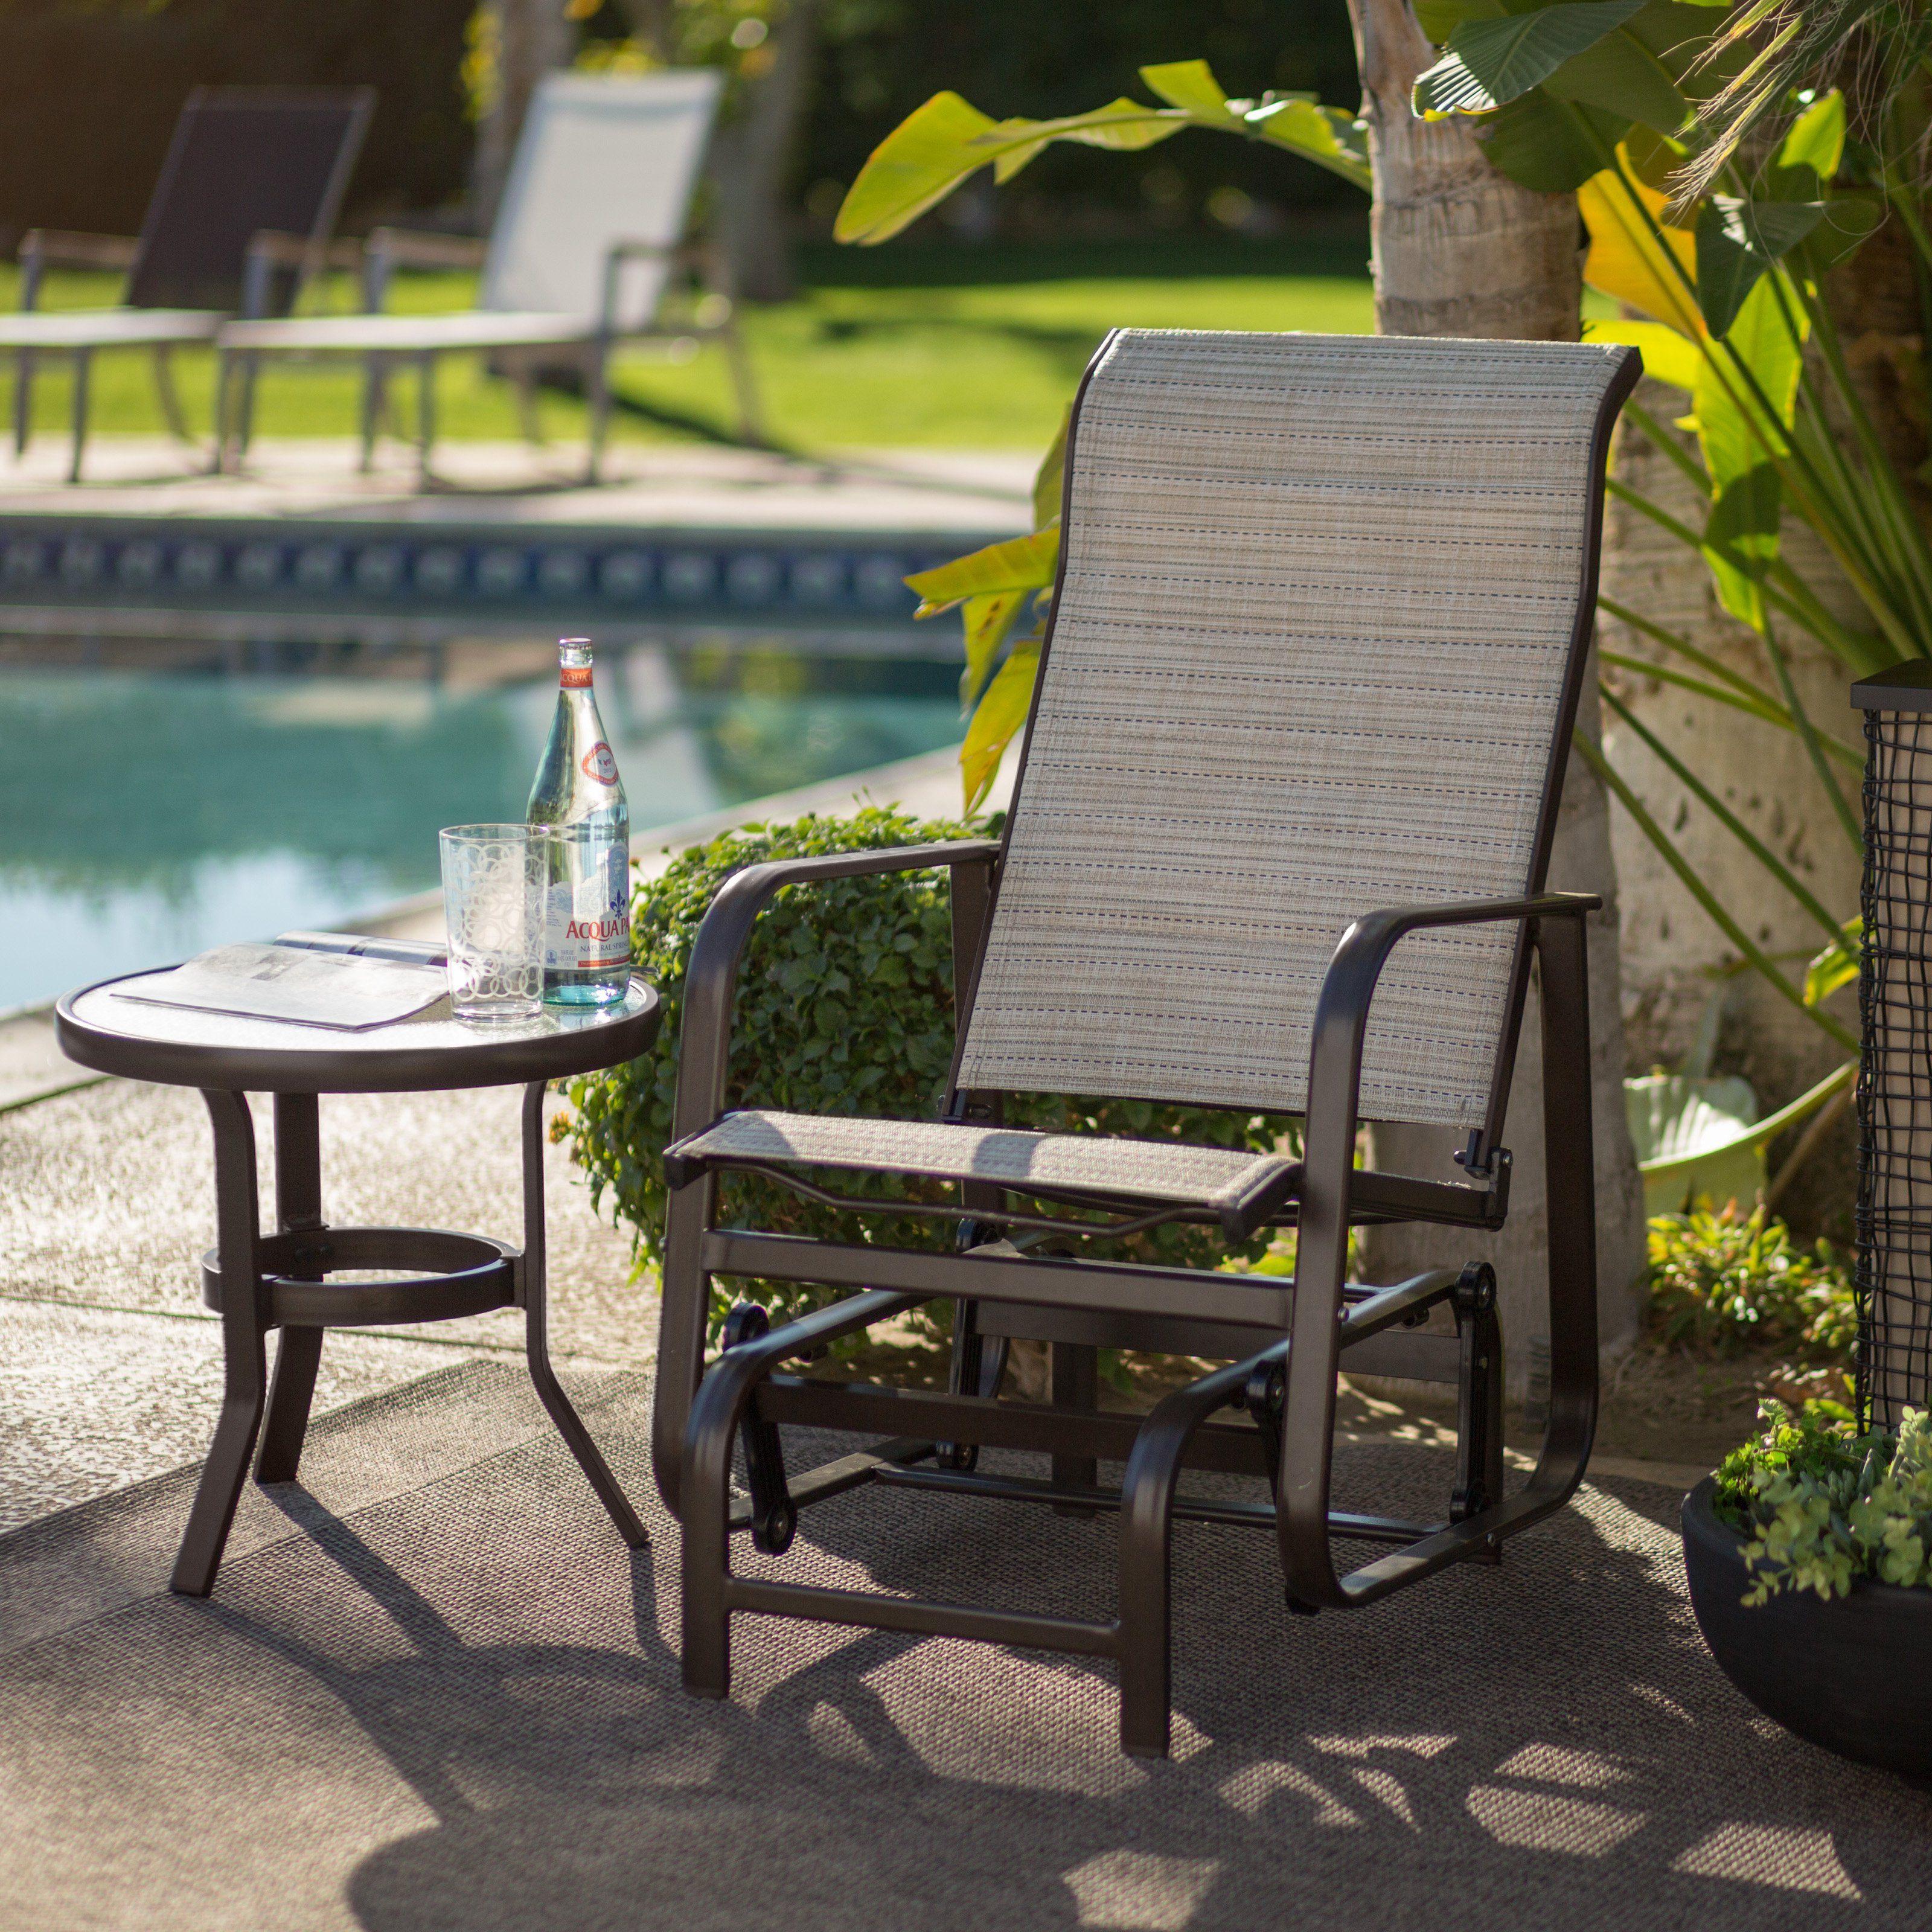 Hayneedle Outdoor Furniture Patio Garden Trend Home Design And Decor